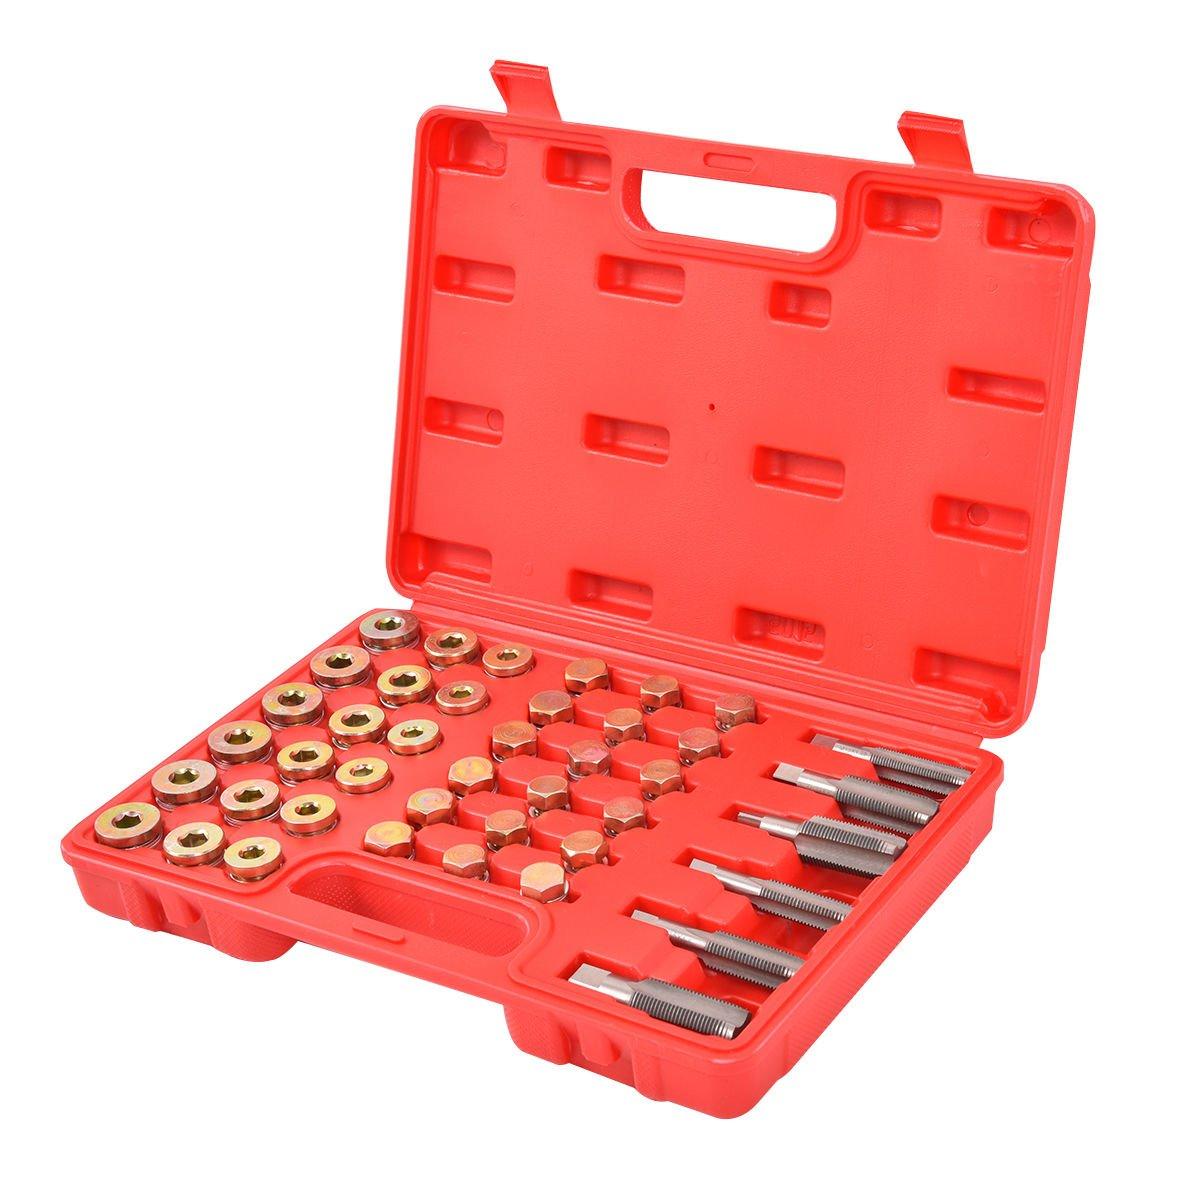 Goplus 114PCS Oil Pan Thread Repair Tool Set Sump Gearbox Drain Plug Key W/Carry Case Superbuy